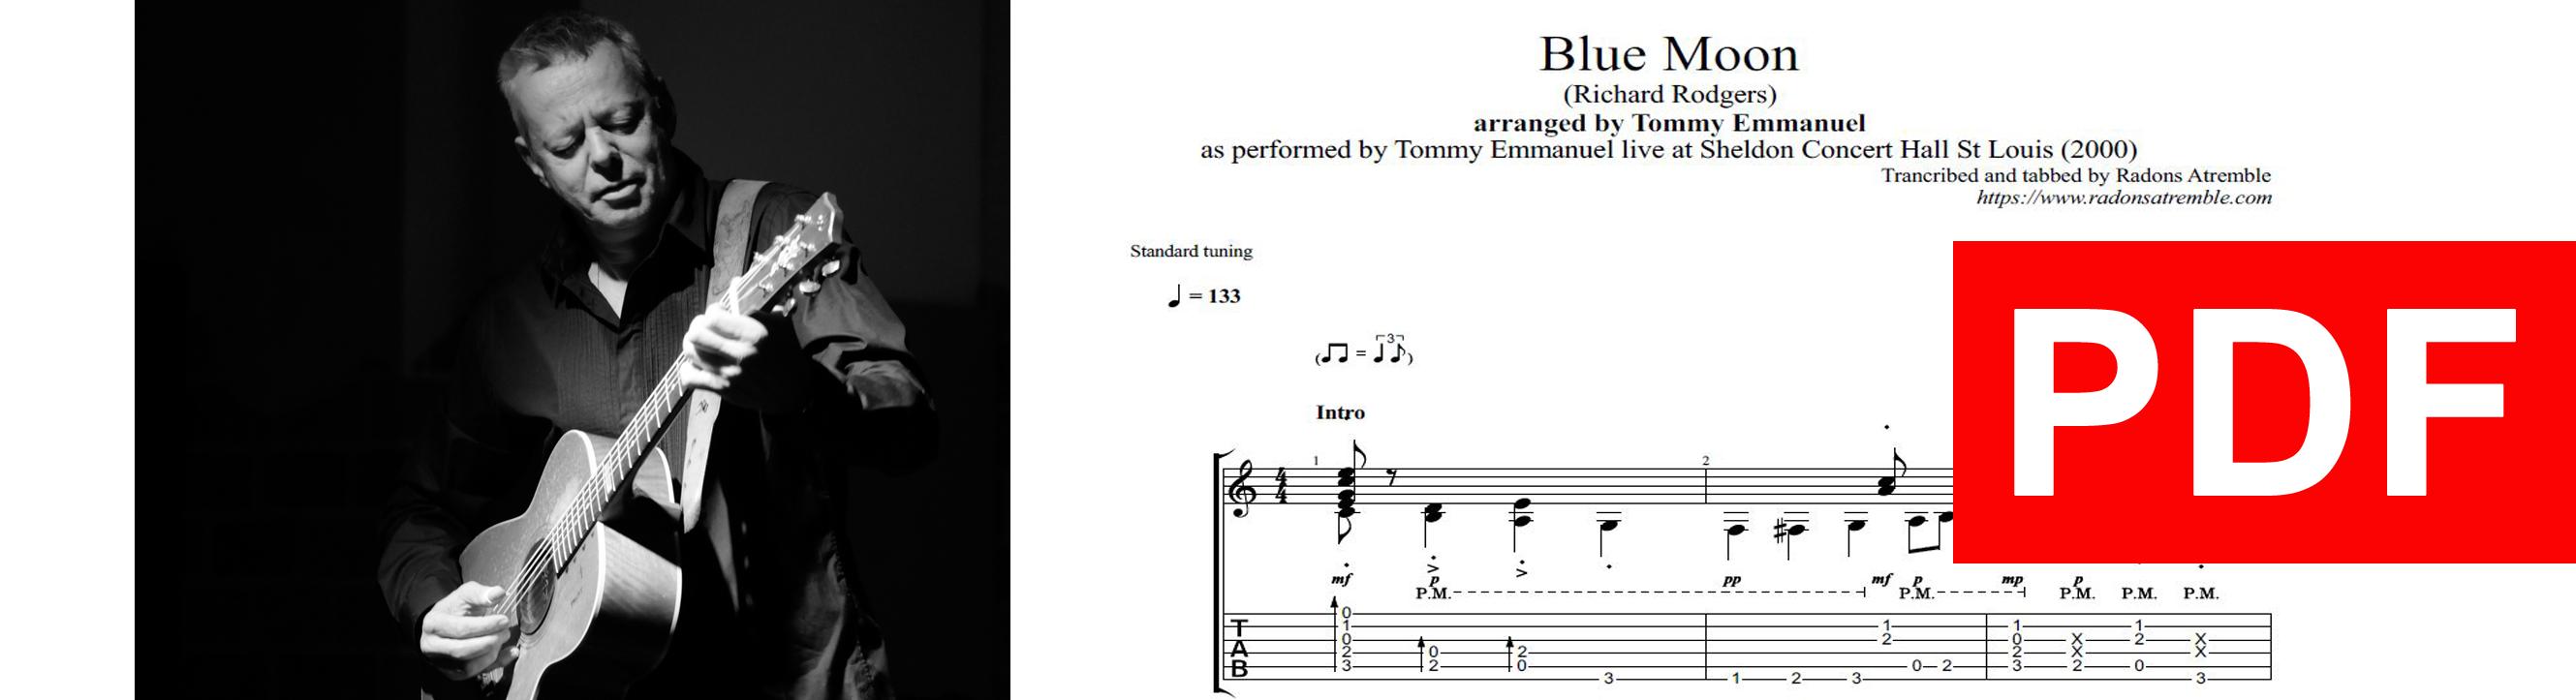 011 Blue Moon - Tommy Emmanuel PDF Image